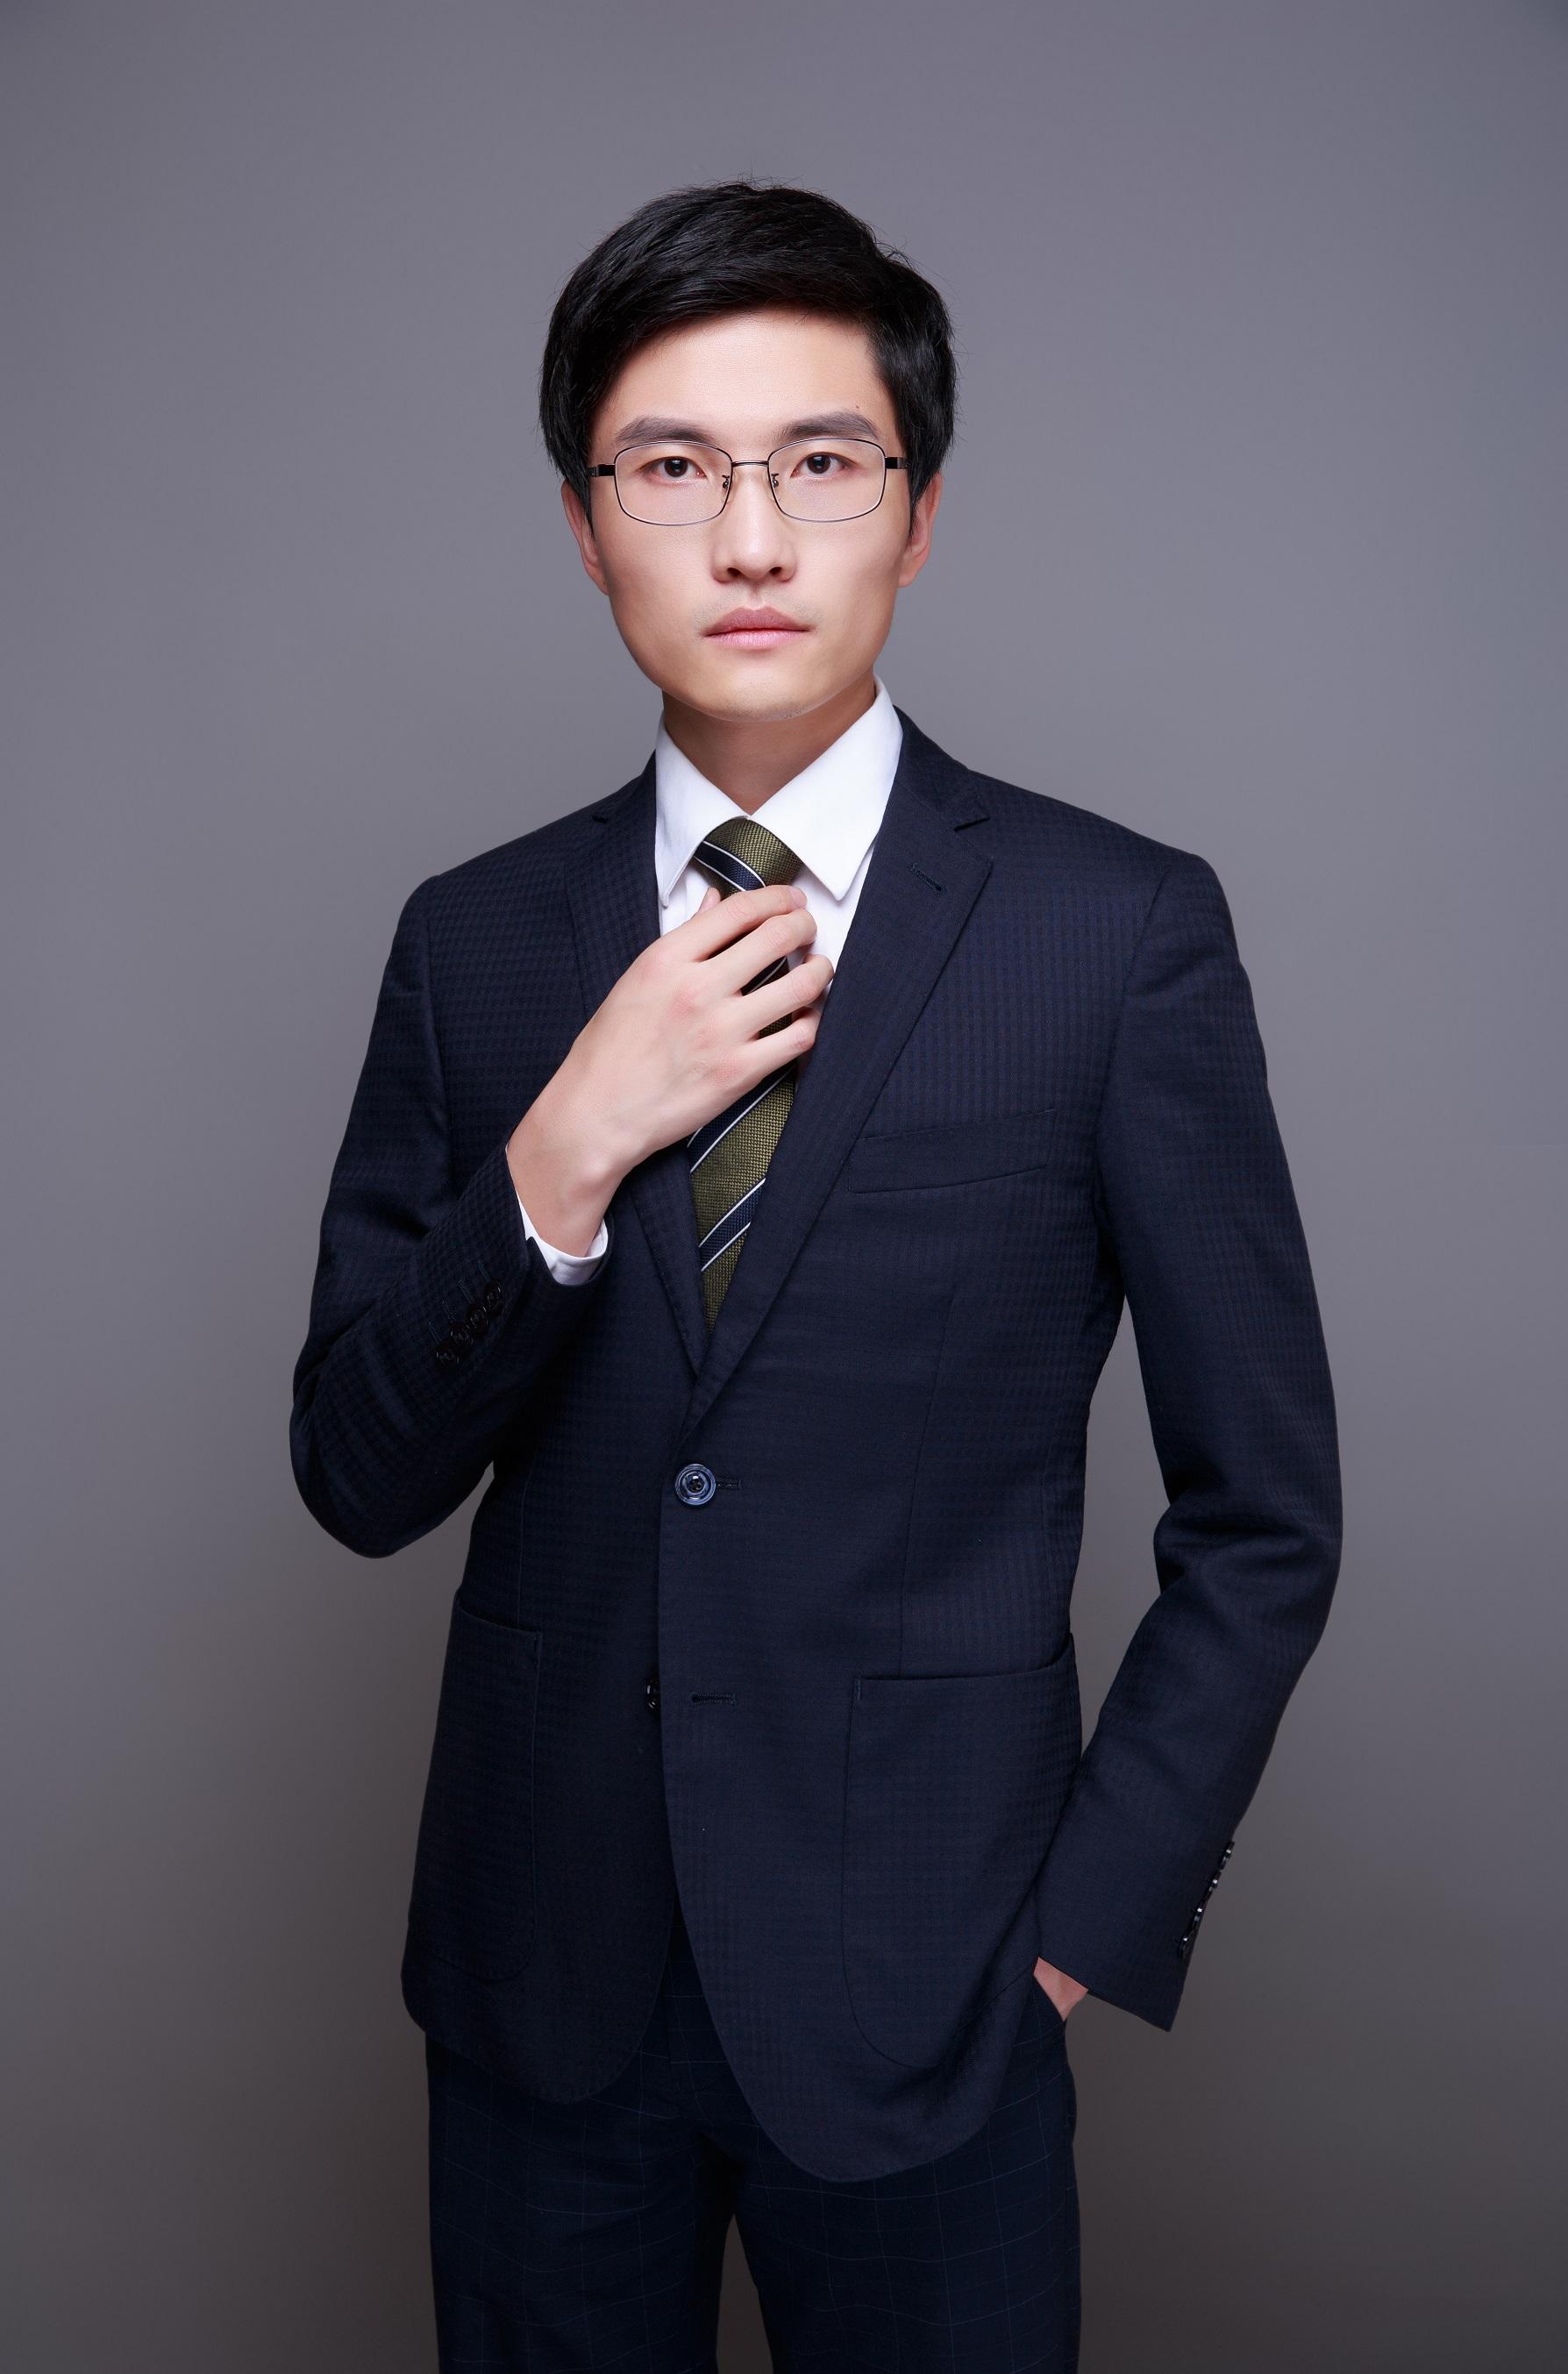 title='周晓亮实习律师'